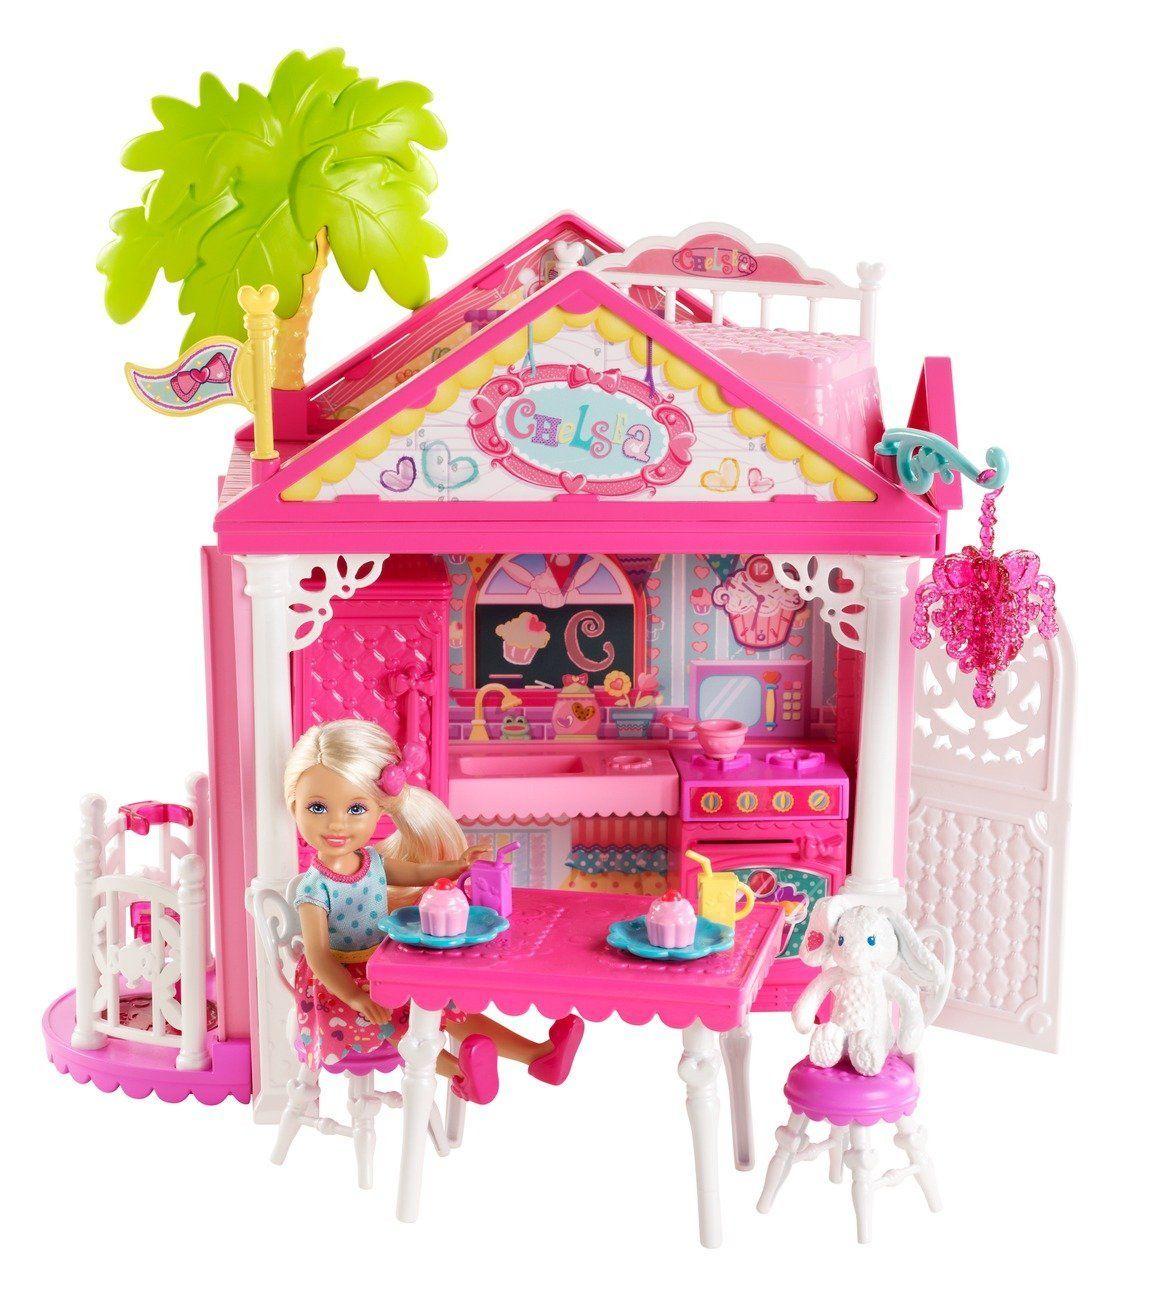 Robot Check Casa De Barbie La Familia De Barbie Juguetes Para Niñas